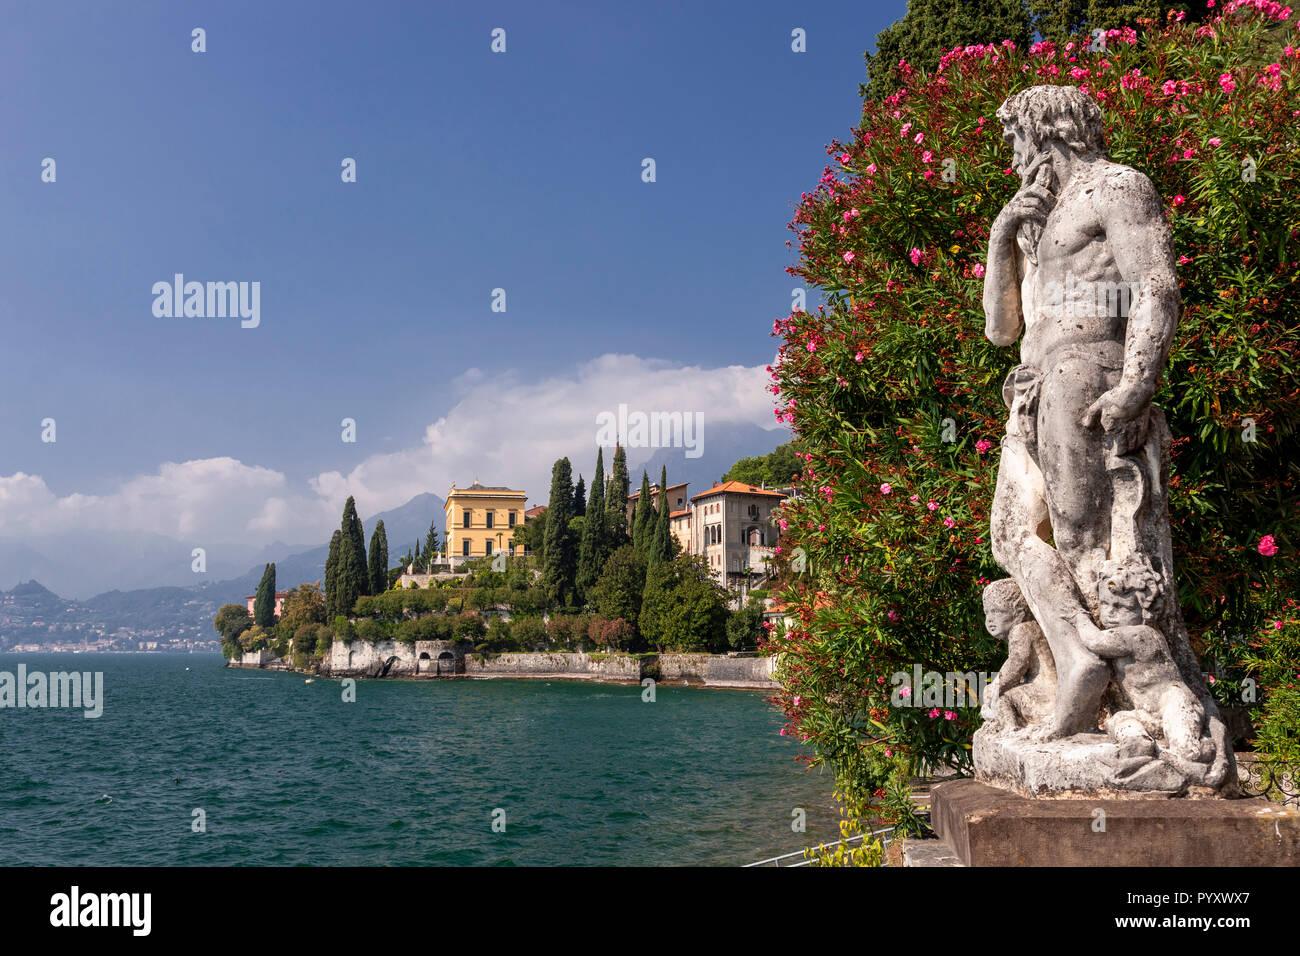 Statue in the gardens of Villa Monastero at Varenna on Lake Como, ItalyStock Photo